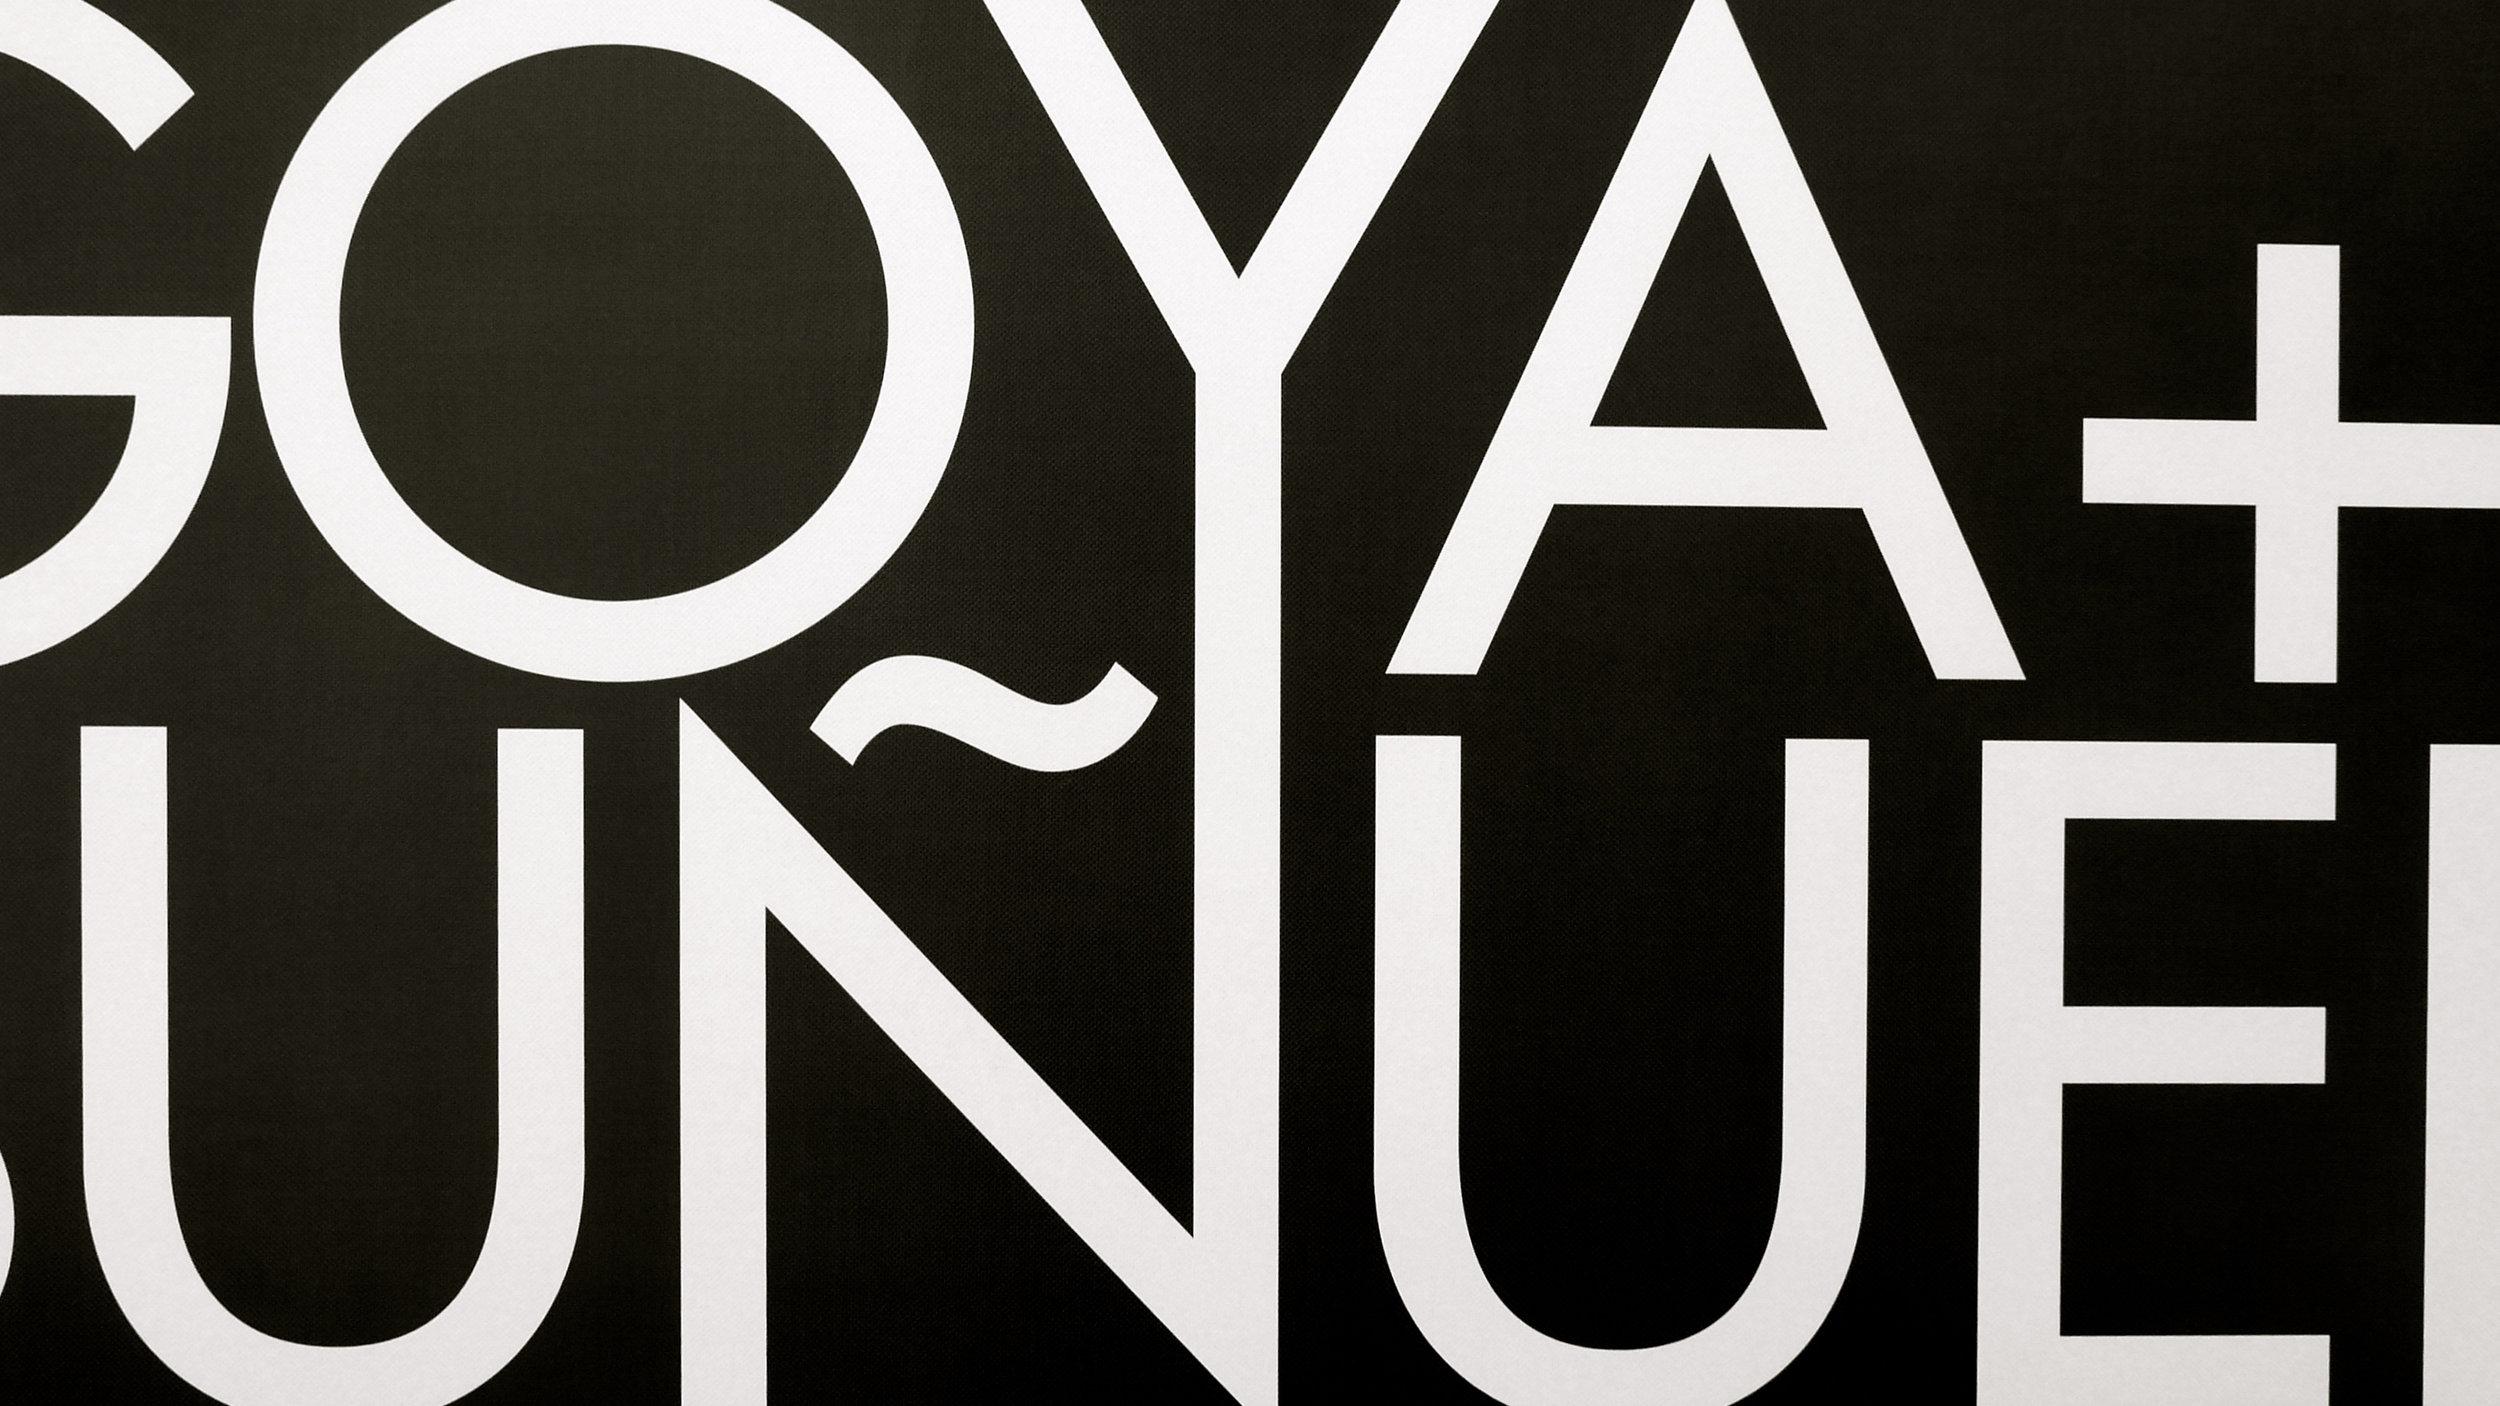 Goya + Buñuel